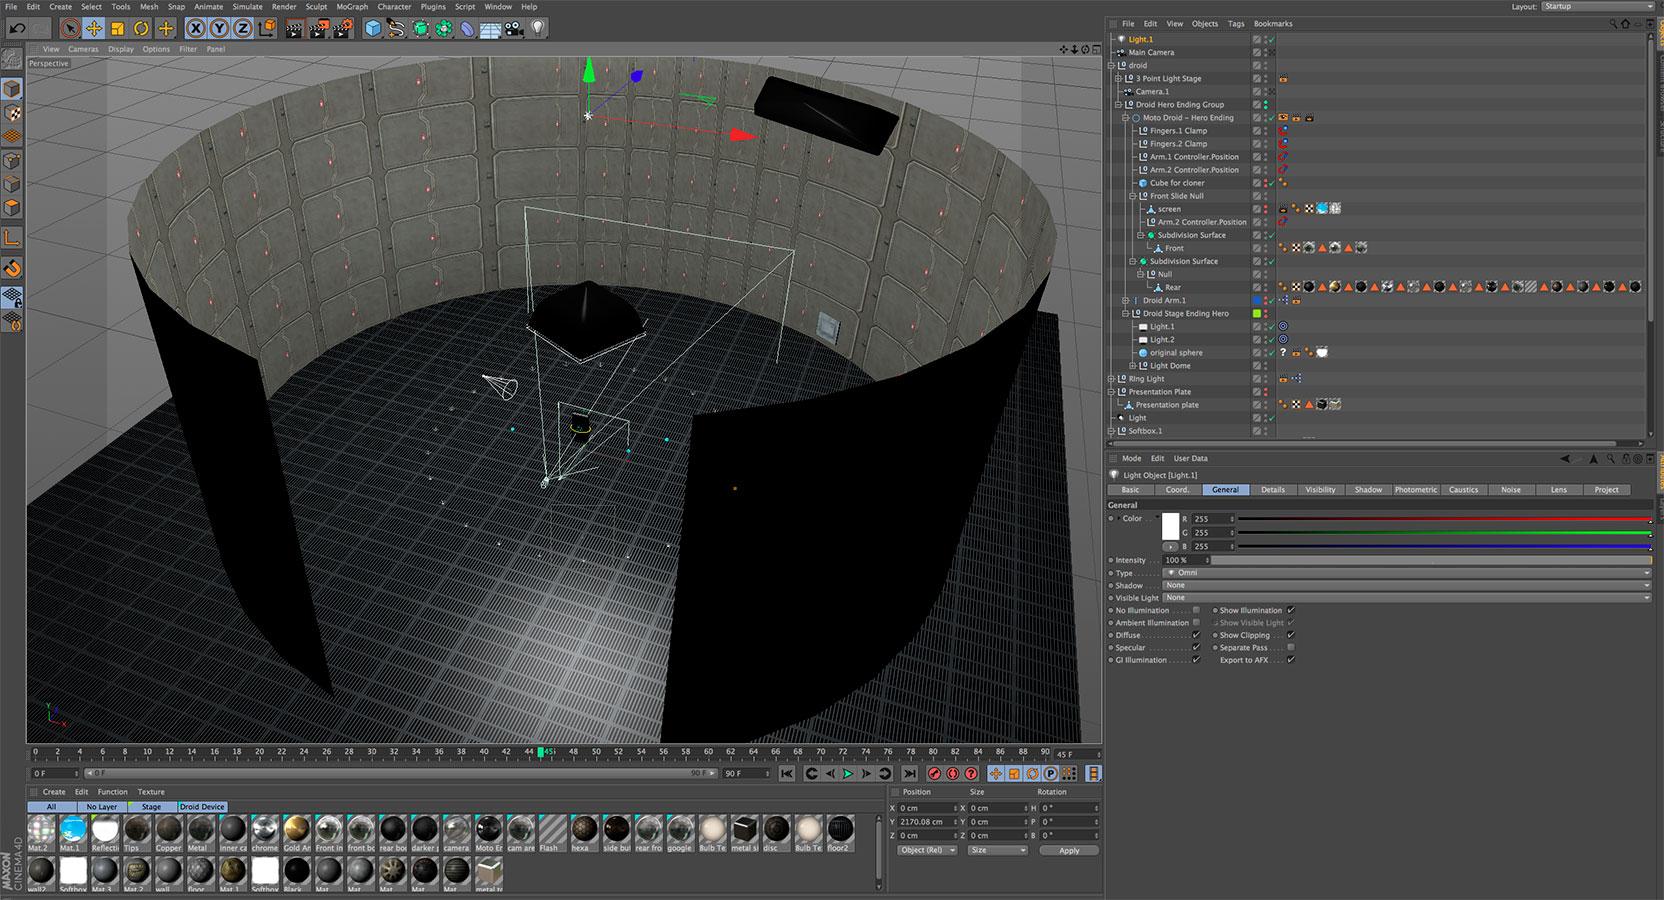 droid-screen1.jpg